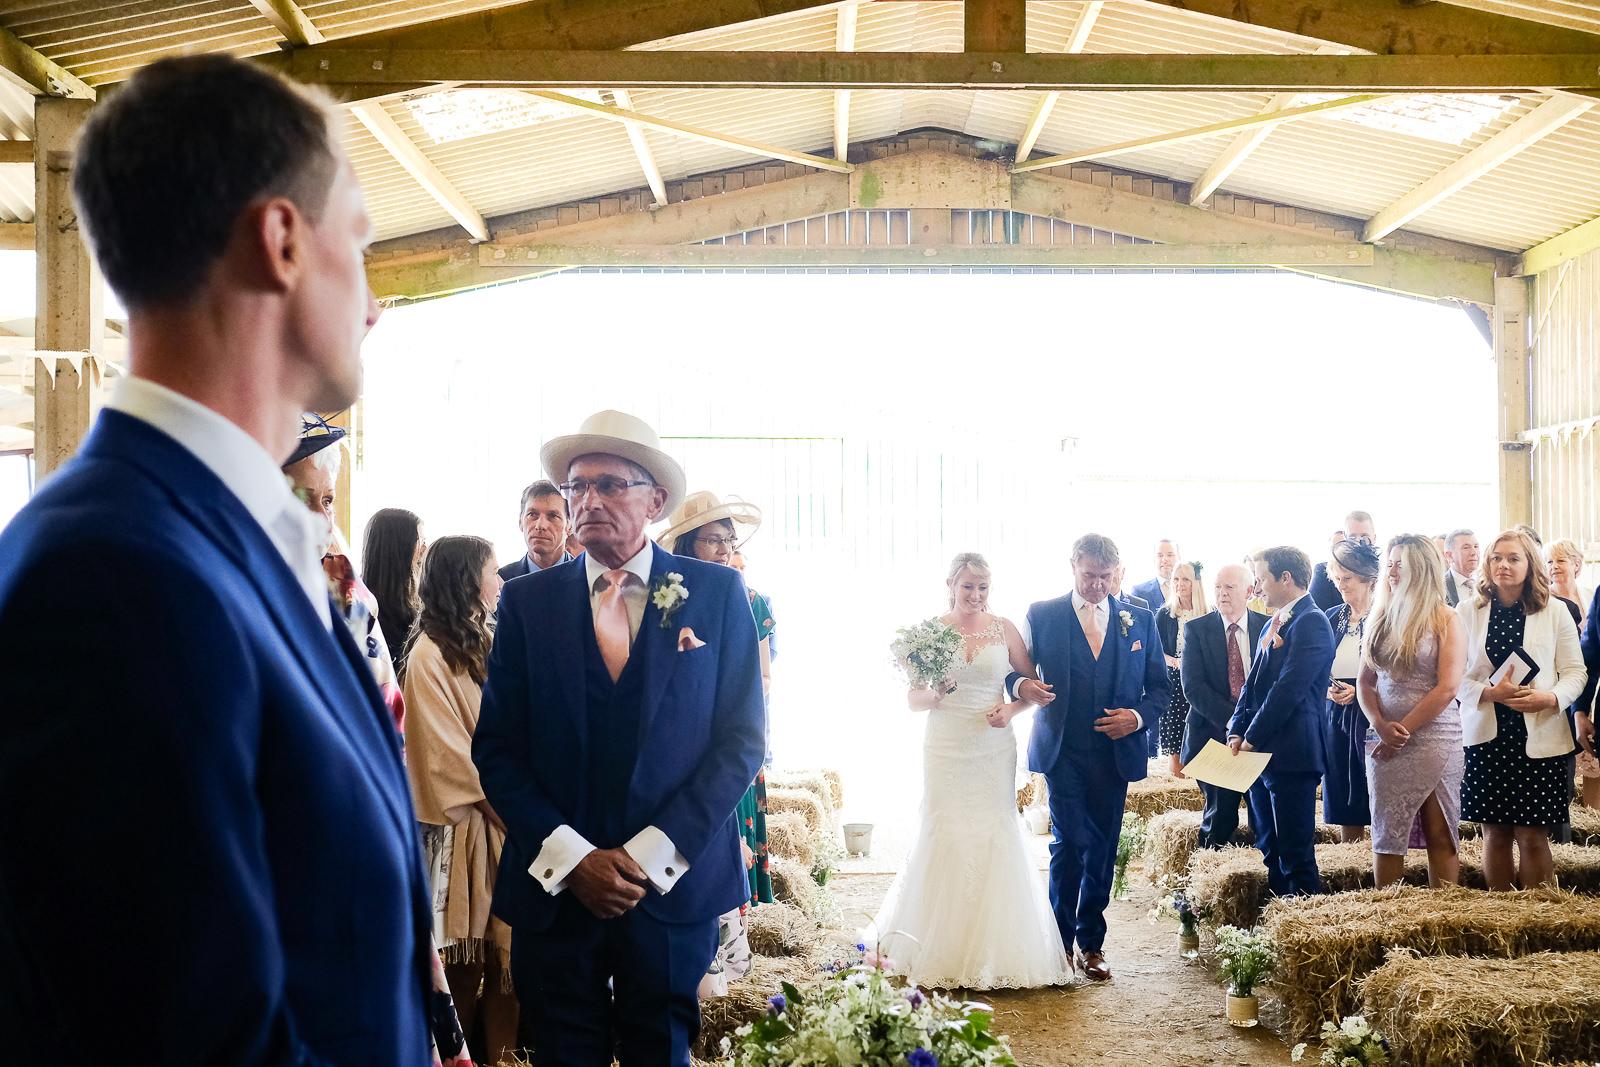 Roscarrock Farm wedding in Cornwall 028.jpg